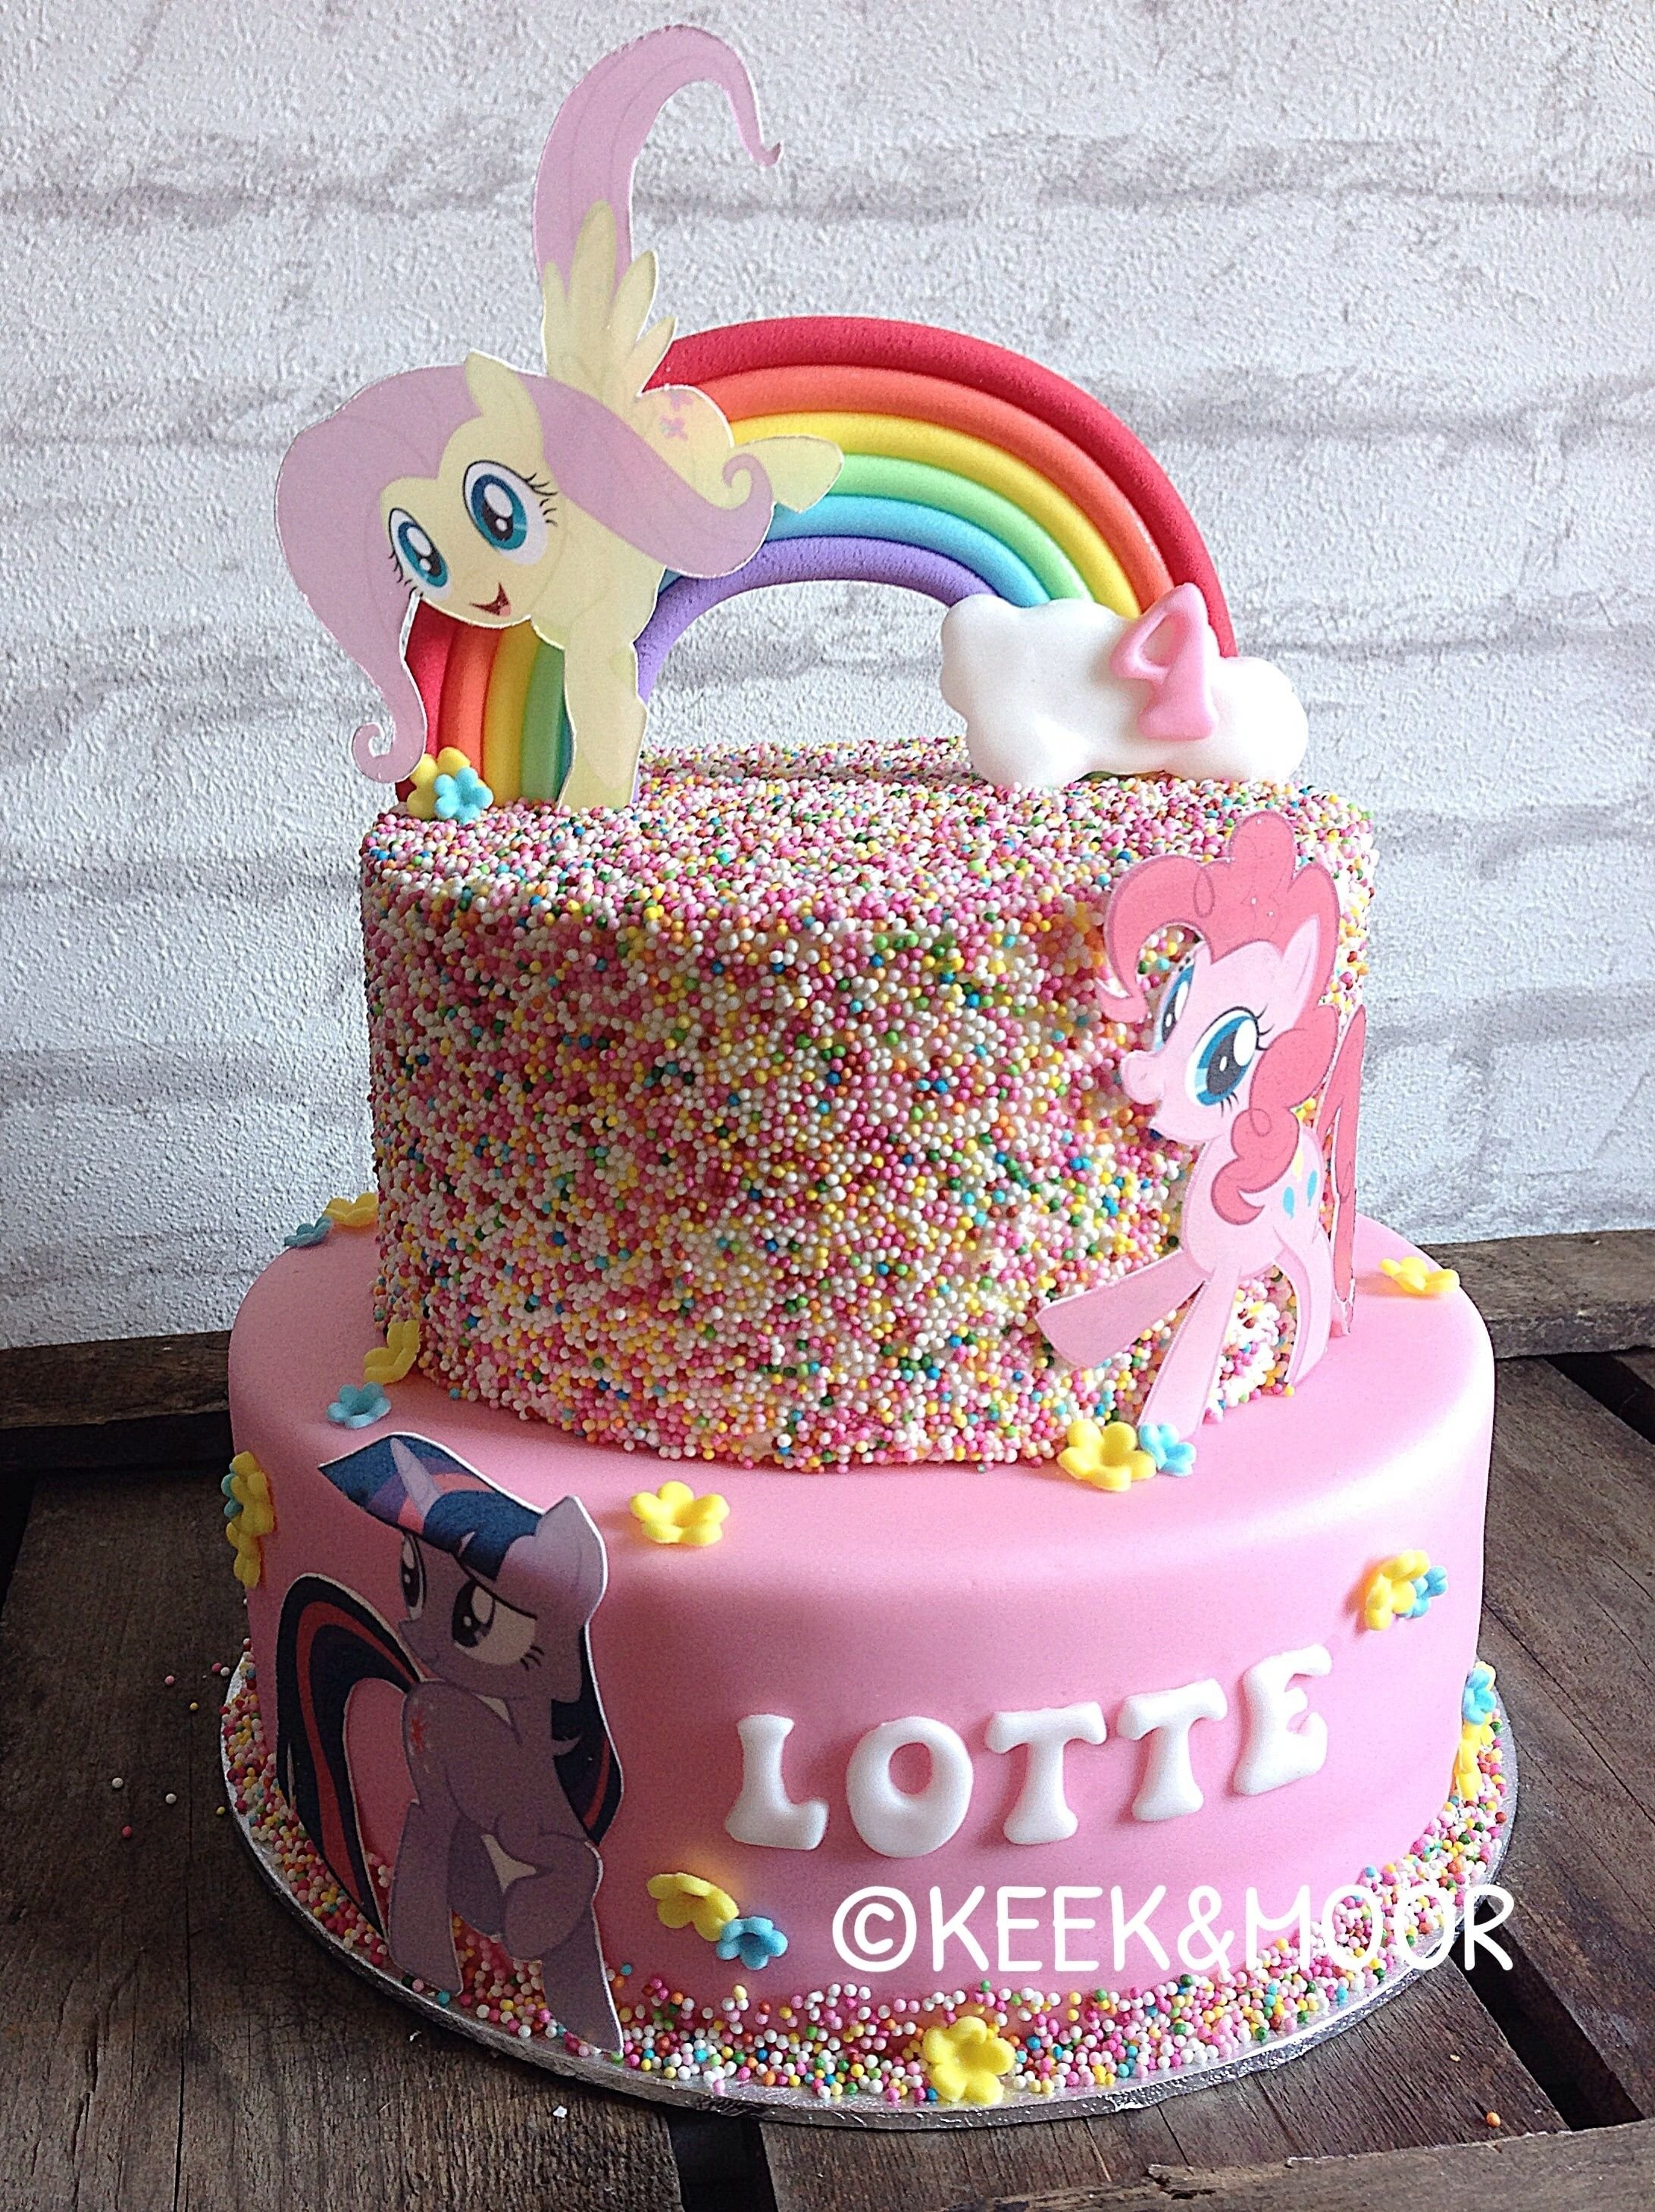 10 Elegant My Little Pony Cake Ideas my little pony cake with sprinkles little girl inspired